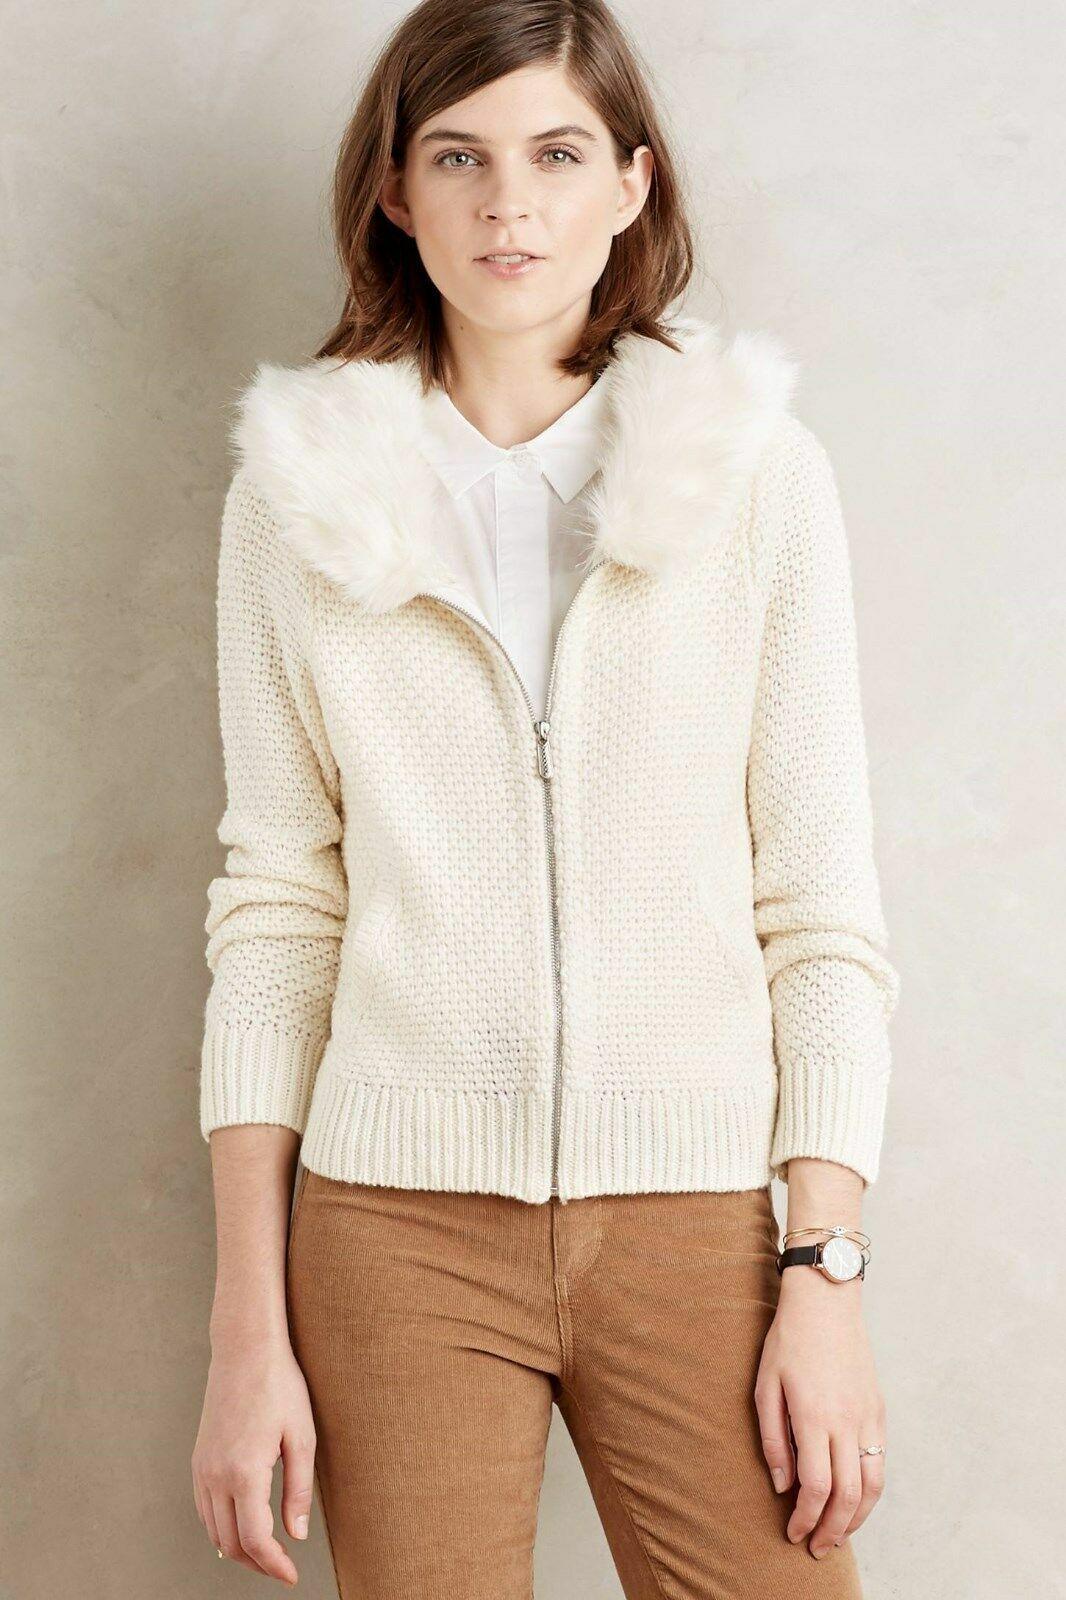 Anthropologie Sleeping on Schnee Branna Ivory Fur Collar autodigan Sweater L NWT